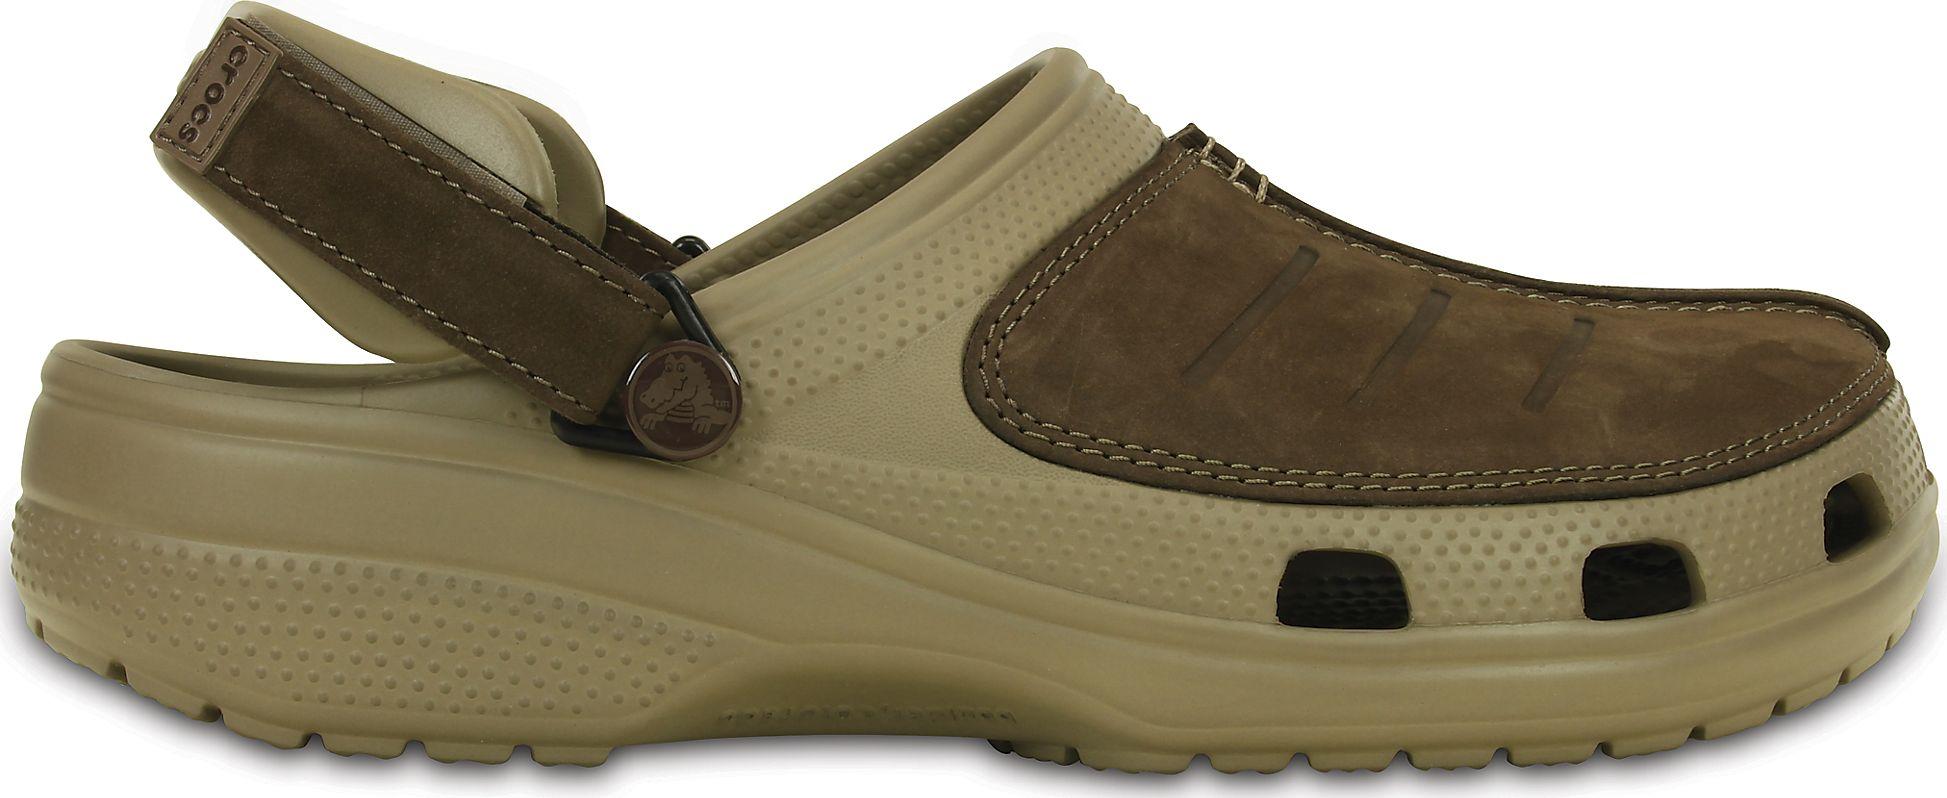 Crocs Yukon Mesa Clog Open24 Ee